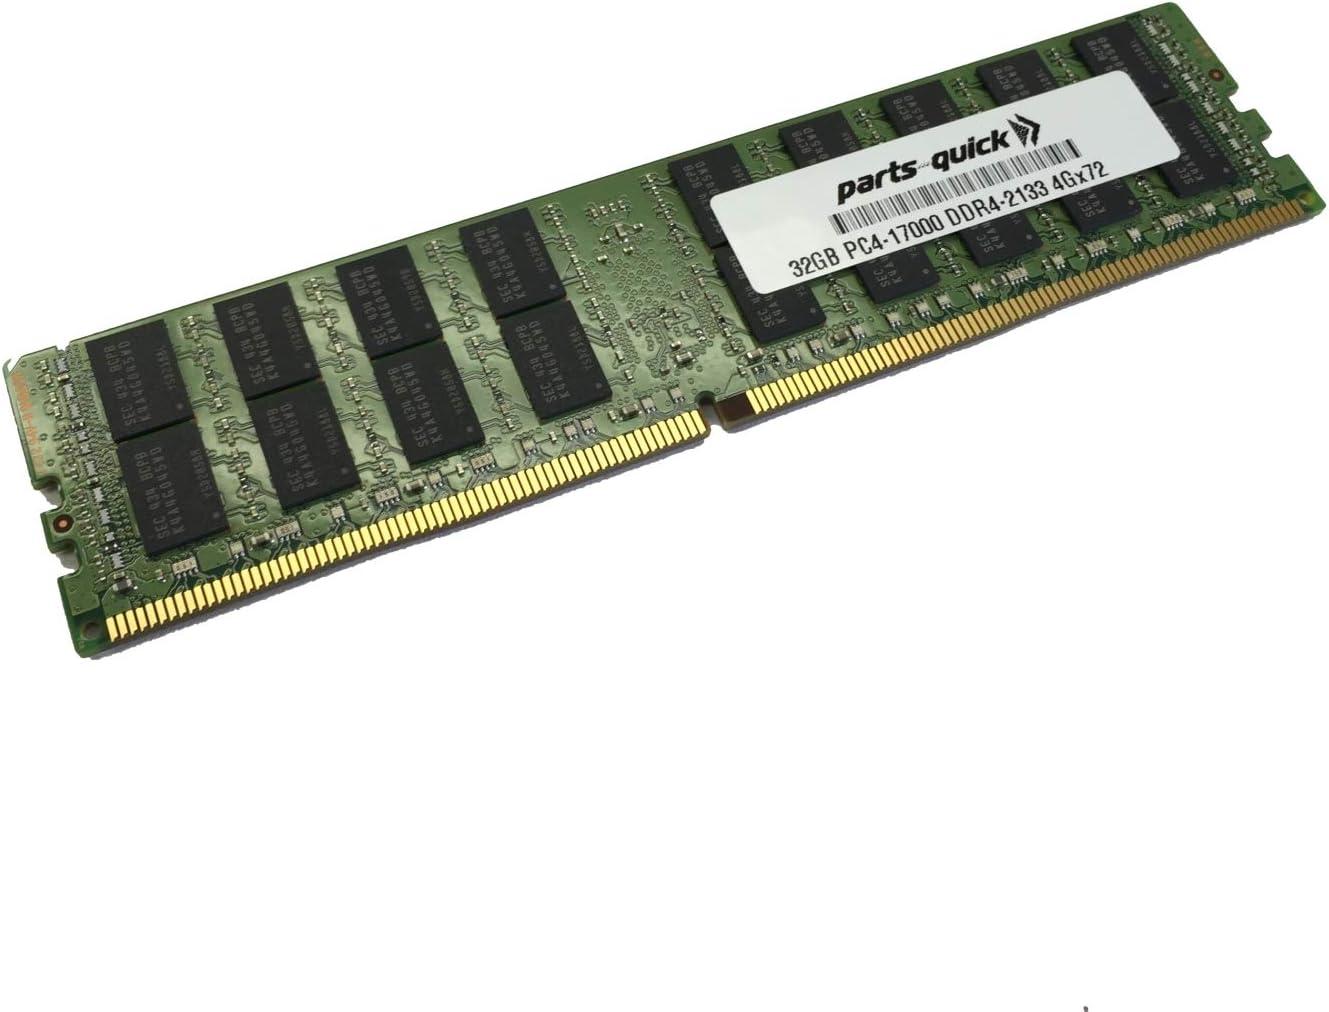 32GB Memory for Acer Veriton P330 F3 DDR4 2133 MHz ECC RDIMM PARTS-QUICK Brand